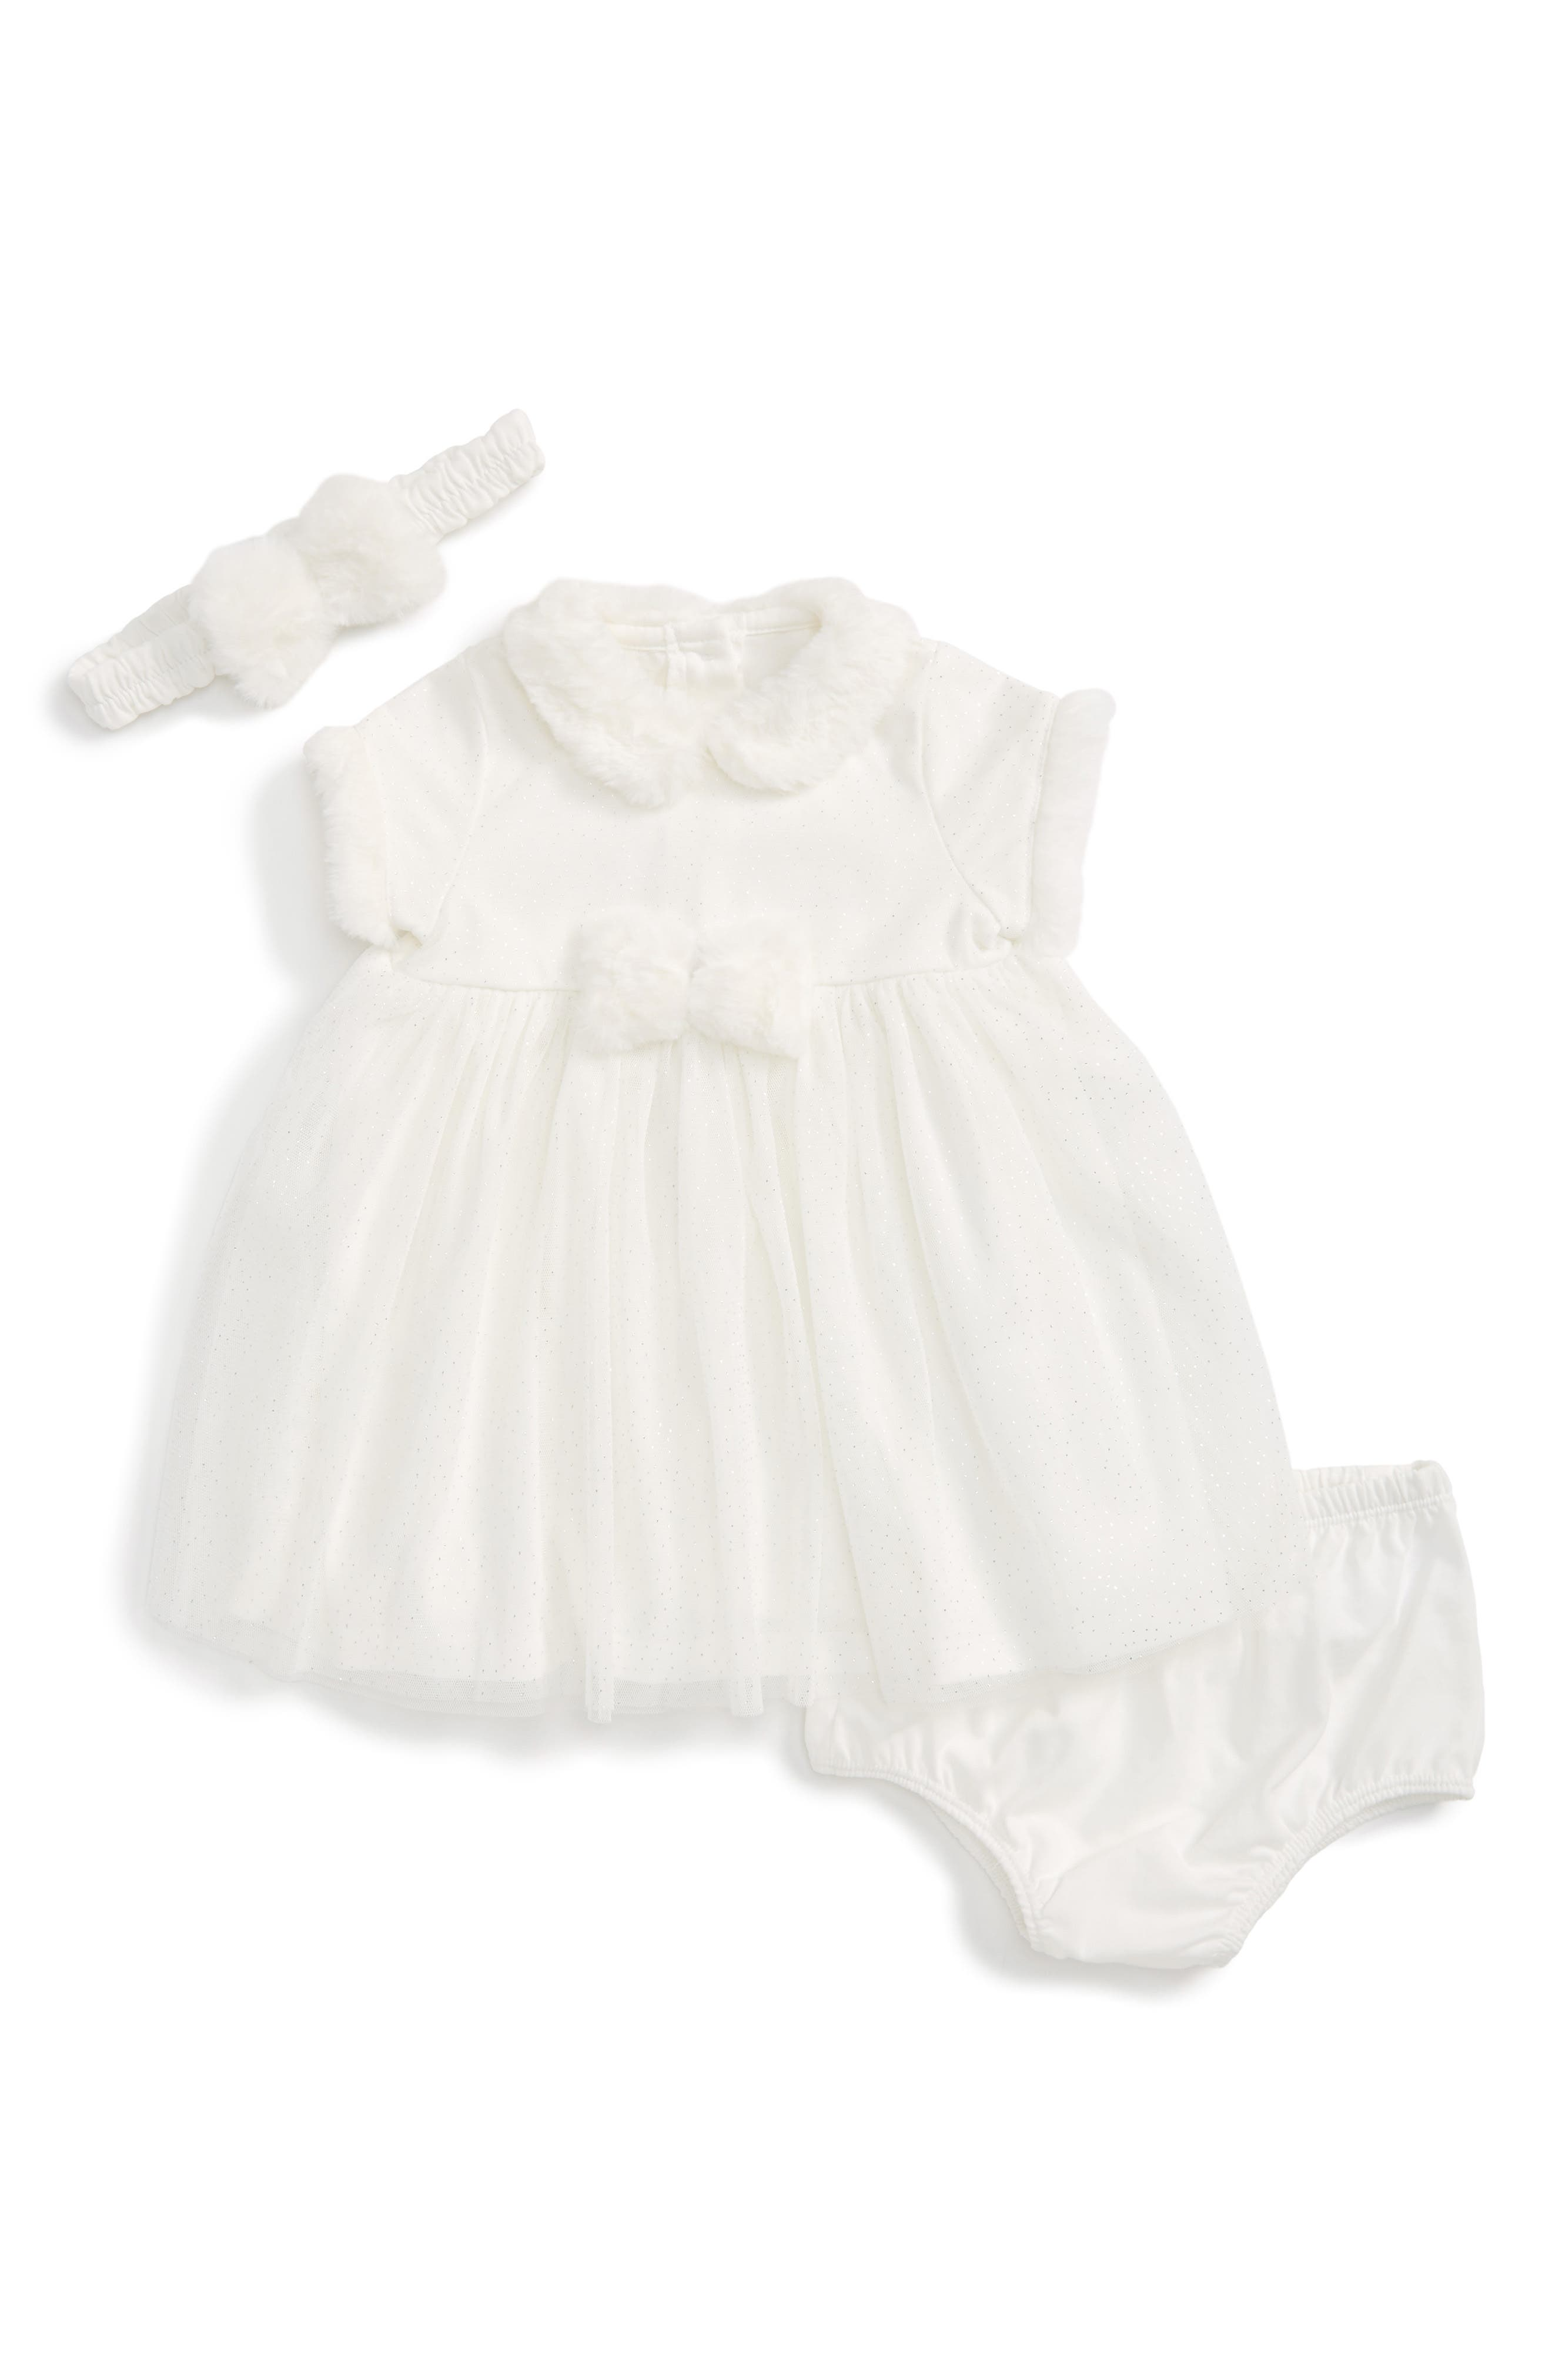 Sparkle Mesh Dress & Headband Set,                             Main thumbnail 1, color,                             Ivory